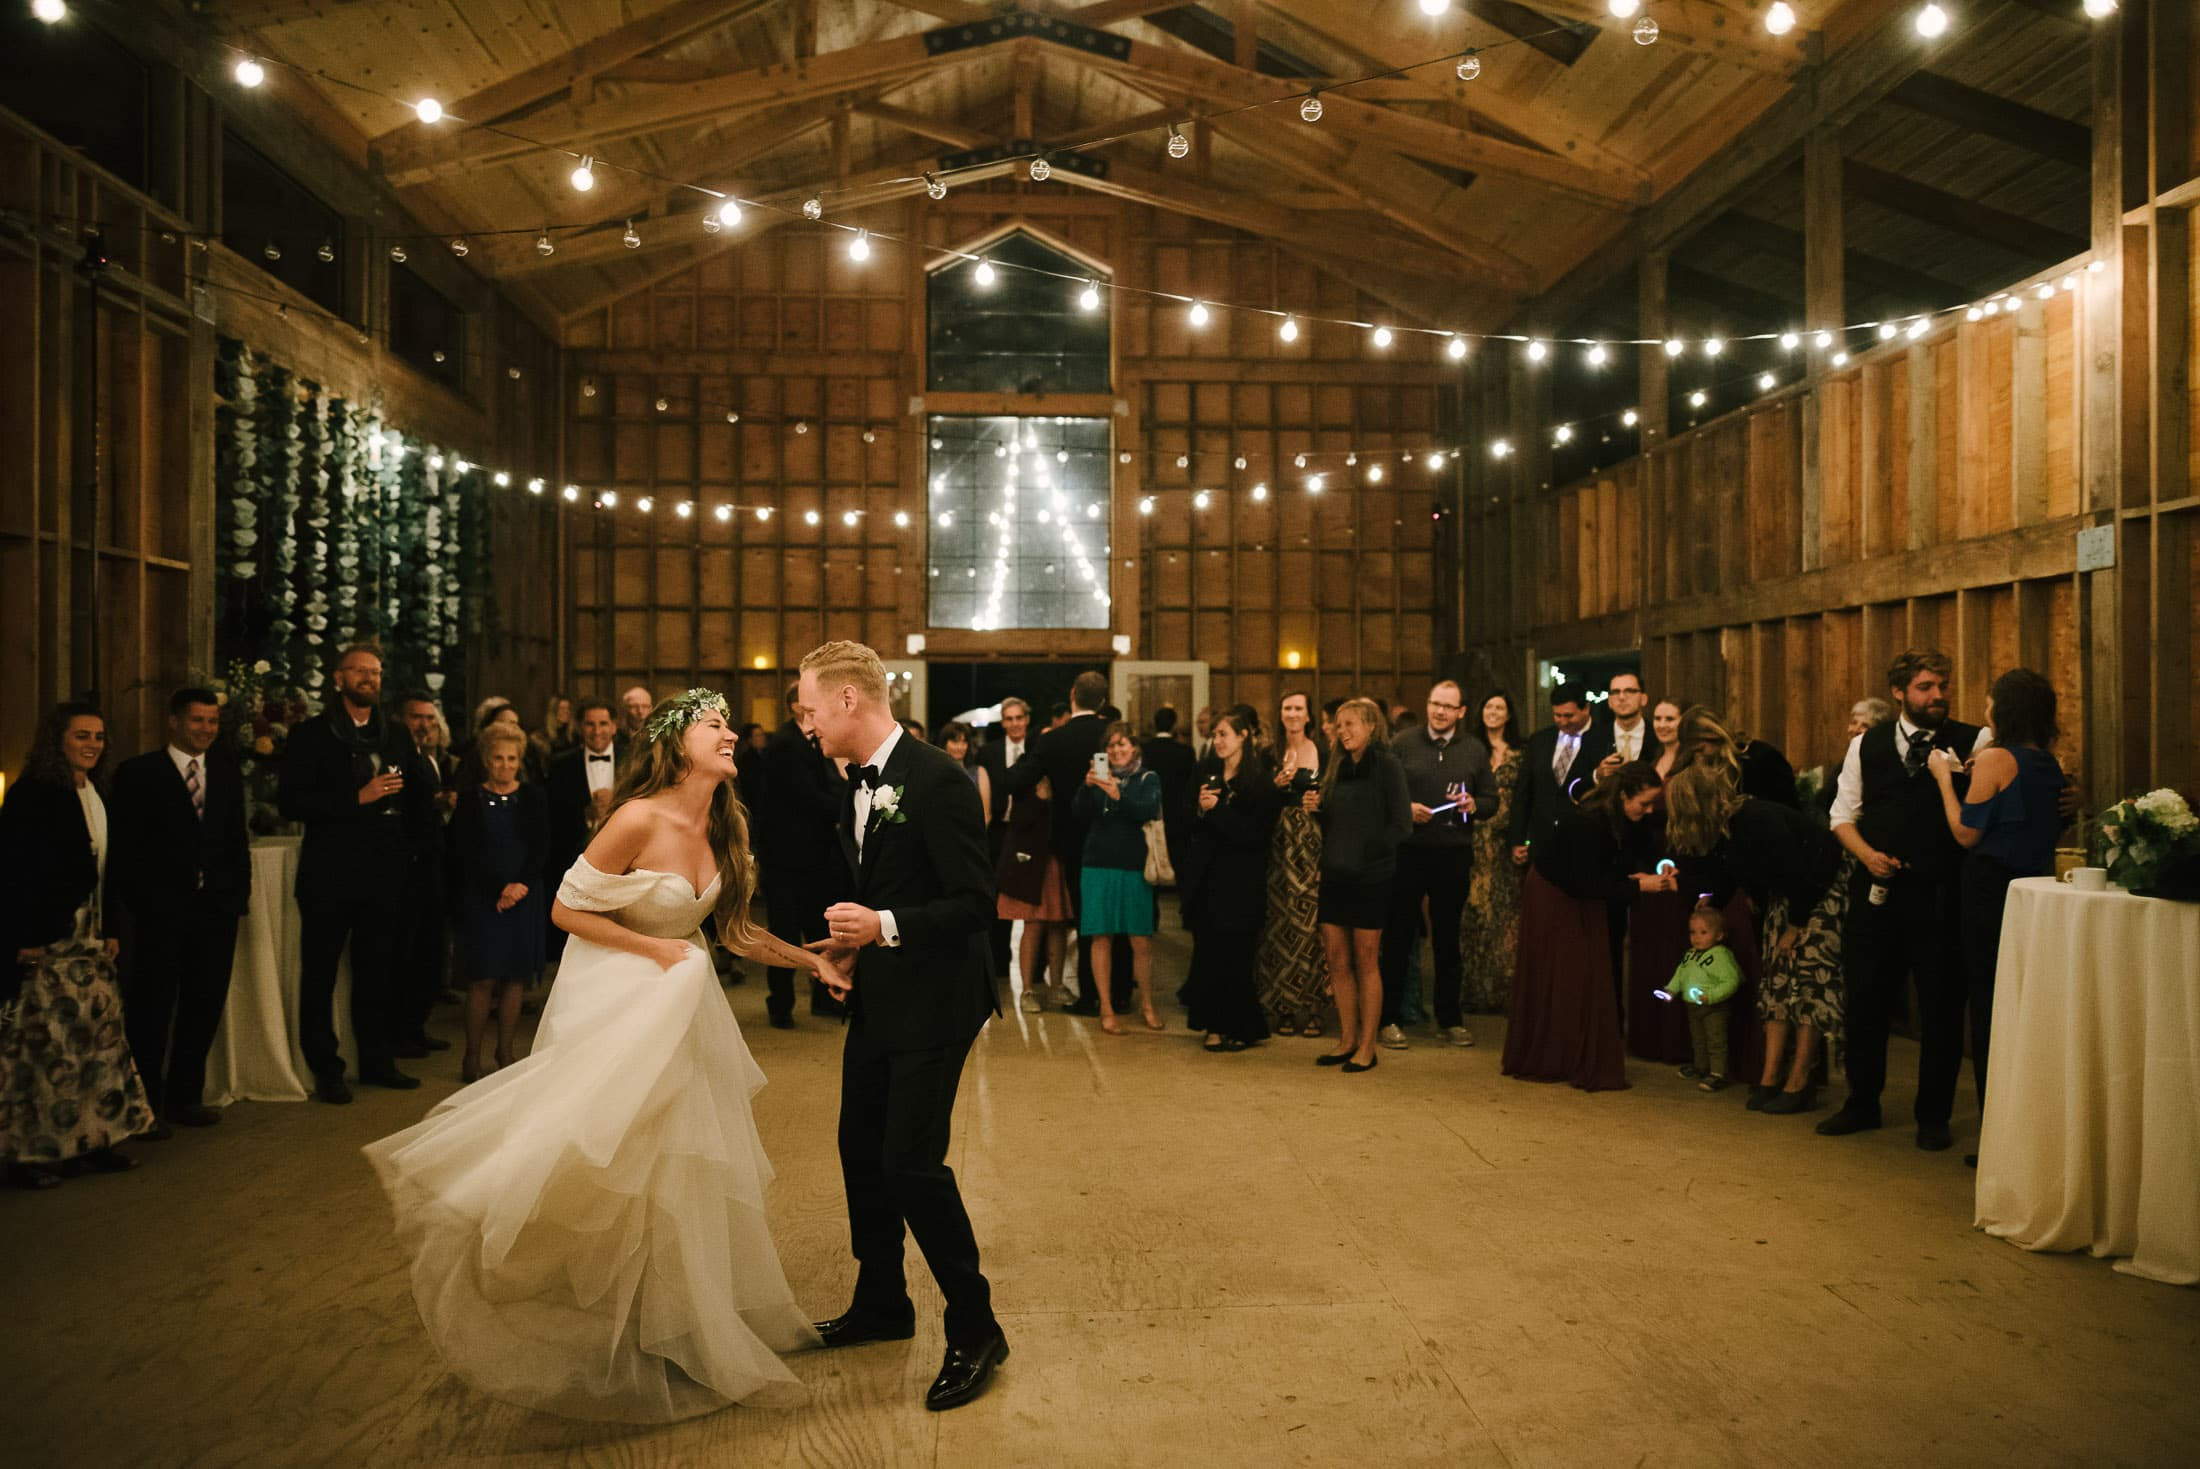 Oz Farm Wedding Barn Dancing